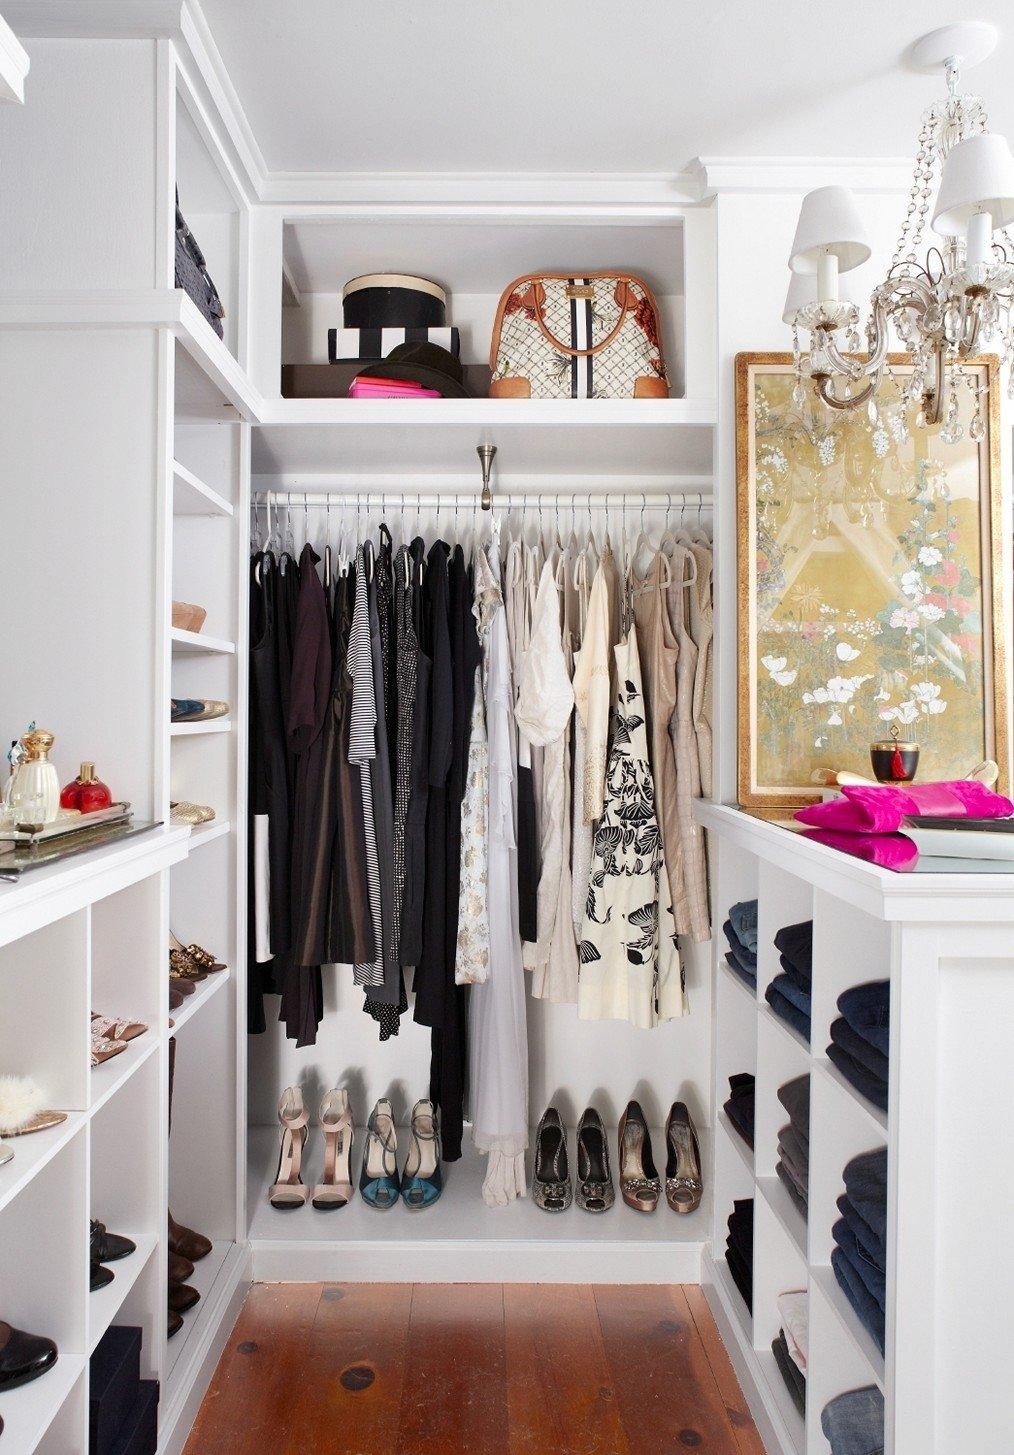 10 Stylish Small Walk In Closet Ideas women small walk in closet ideas 2021